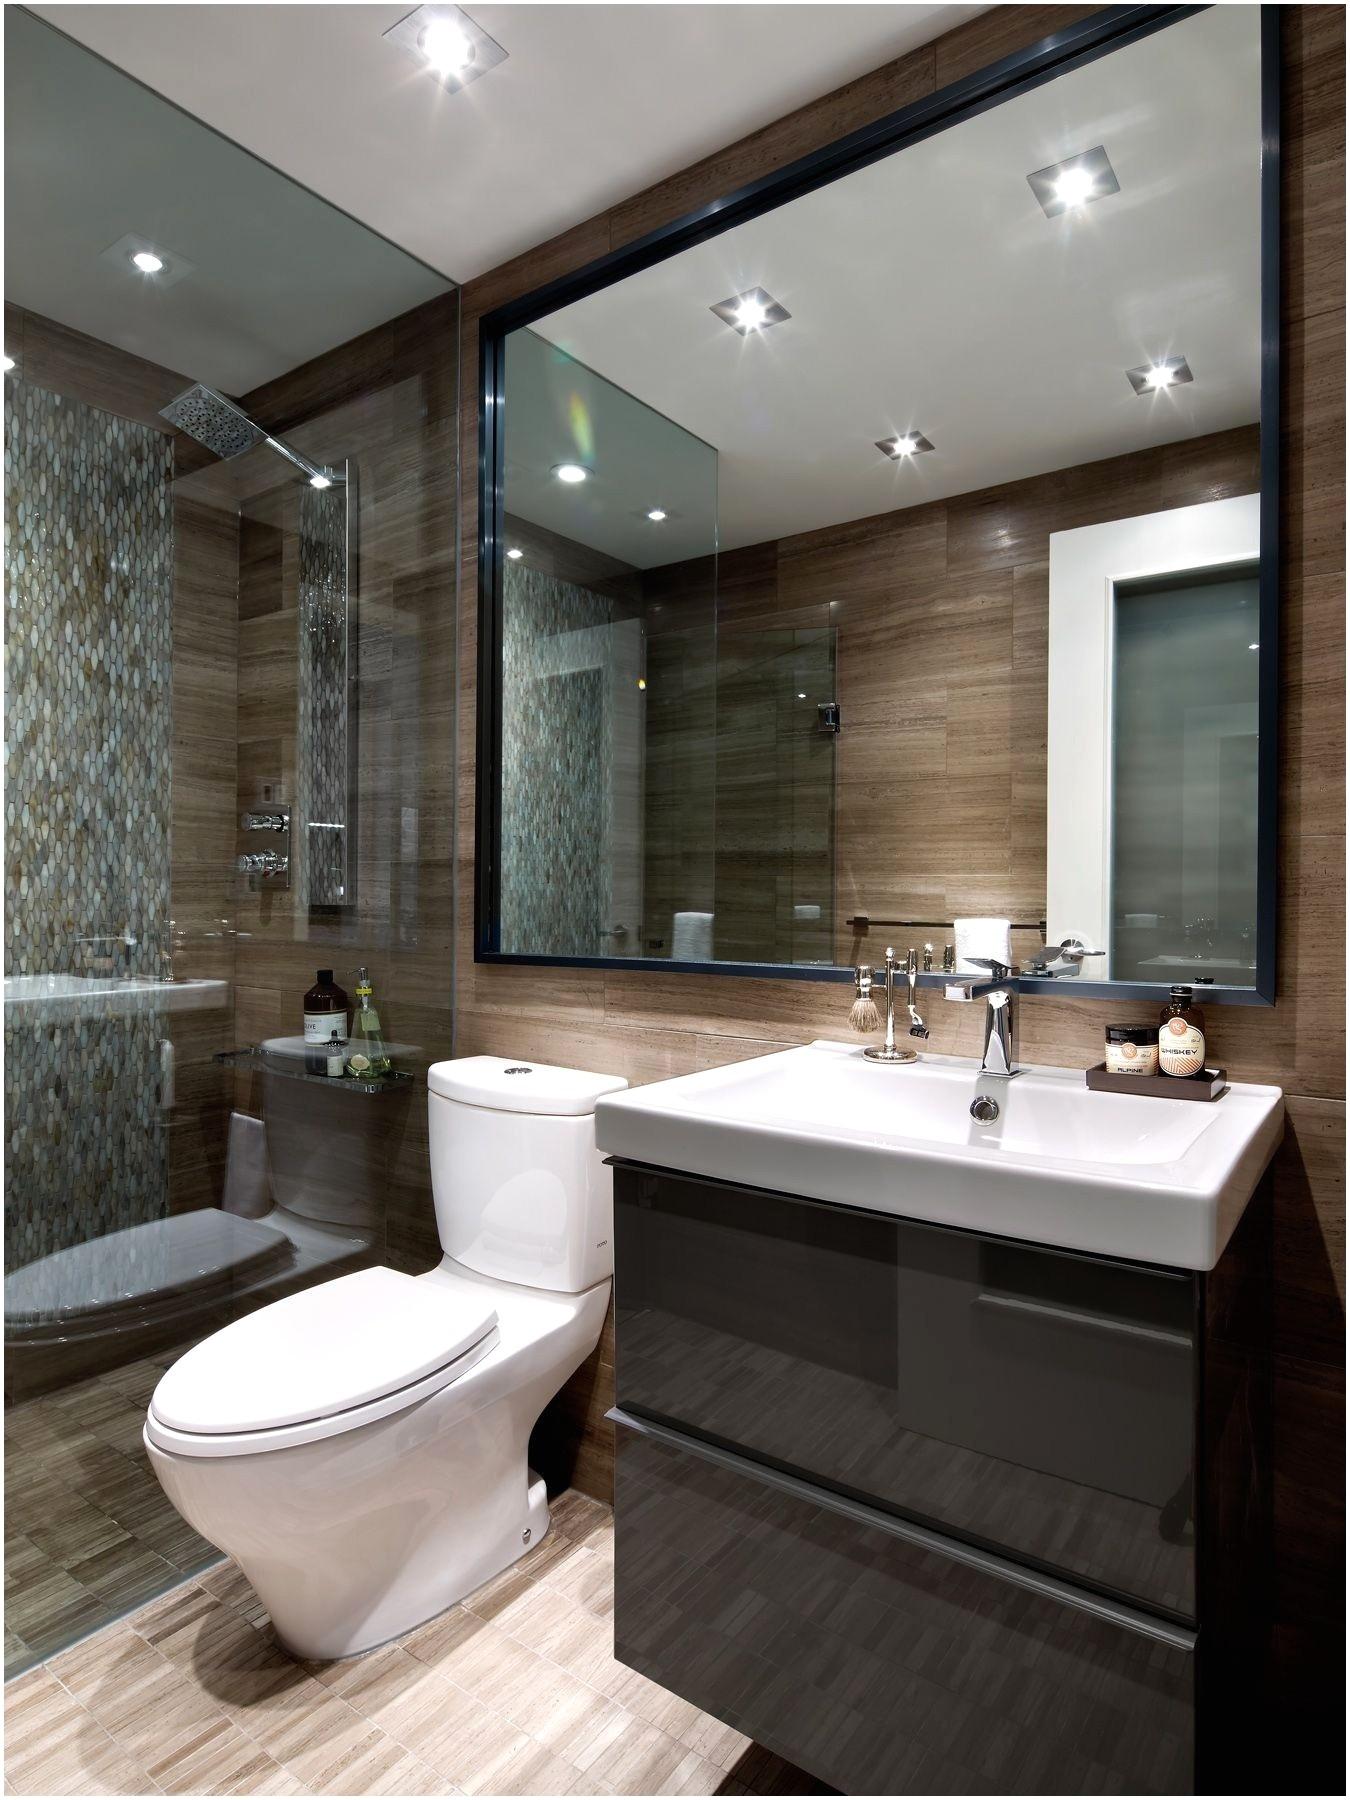 Chic Bathroom Design Ideas Lowes Bathroom Remodeling Costs Adorable Diy Bathroom Remodel Lowes